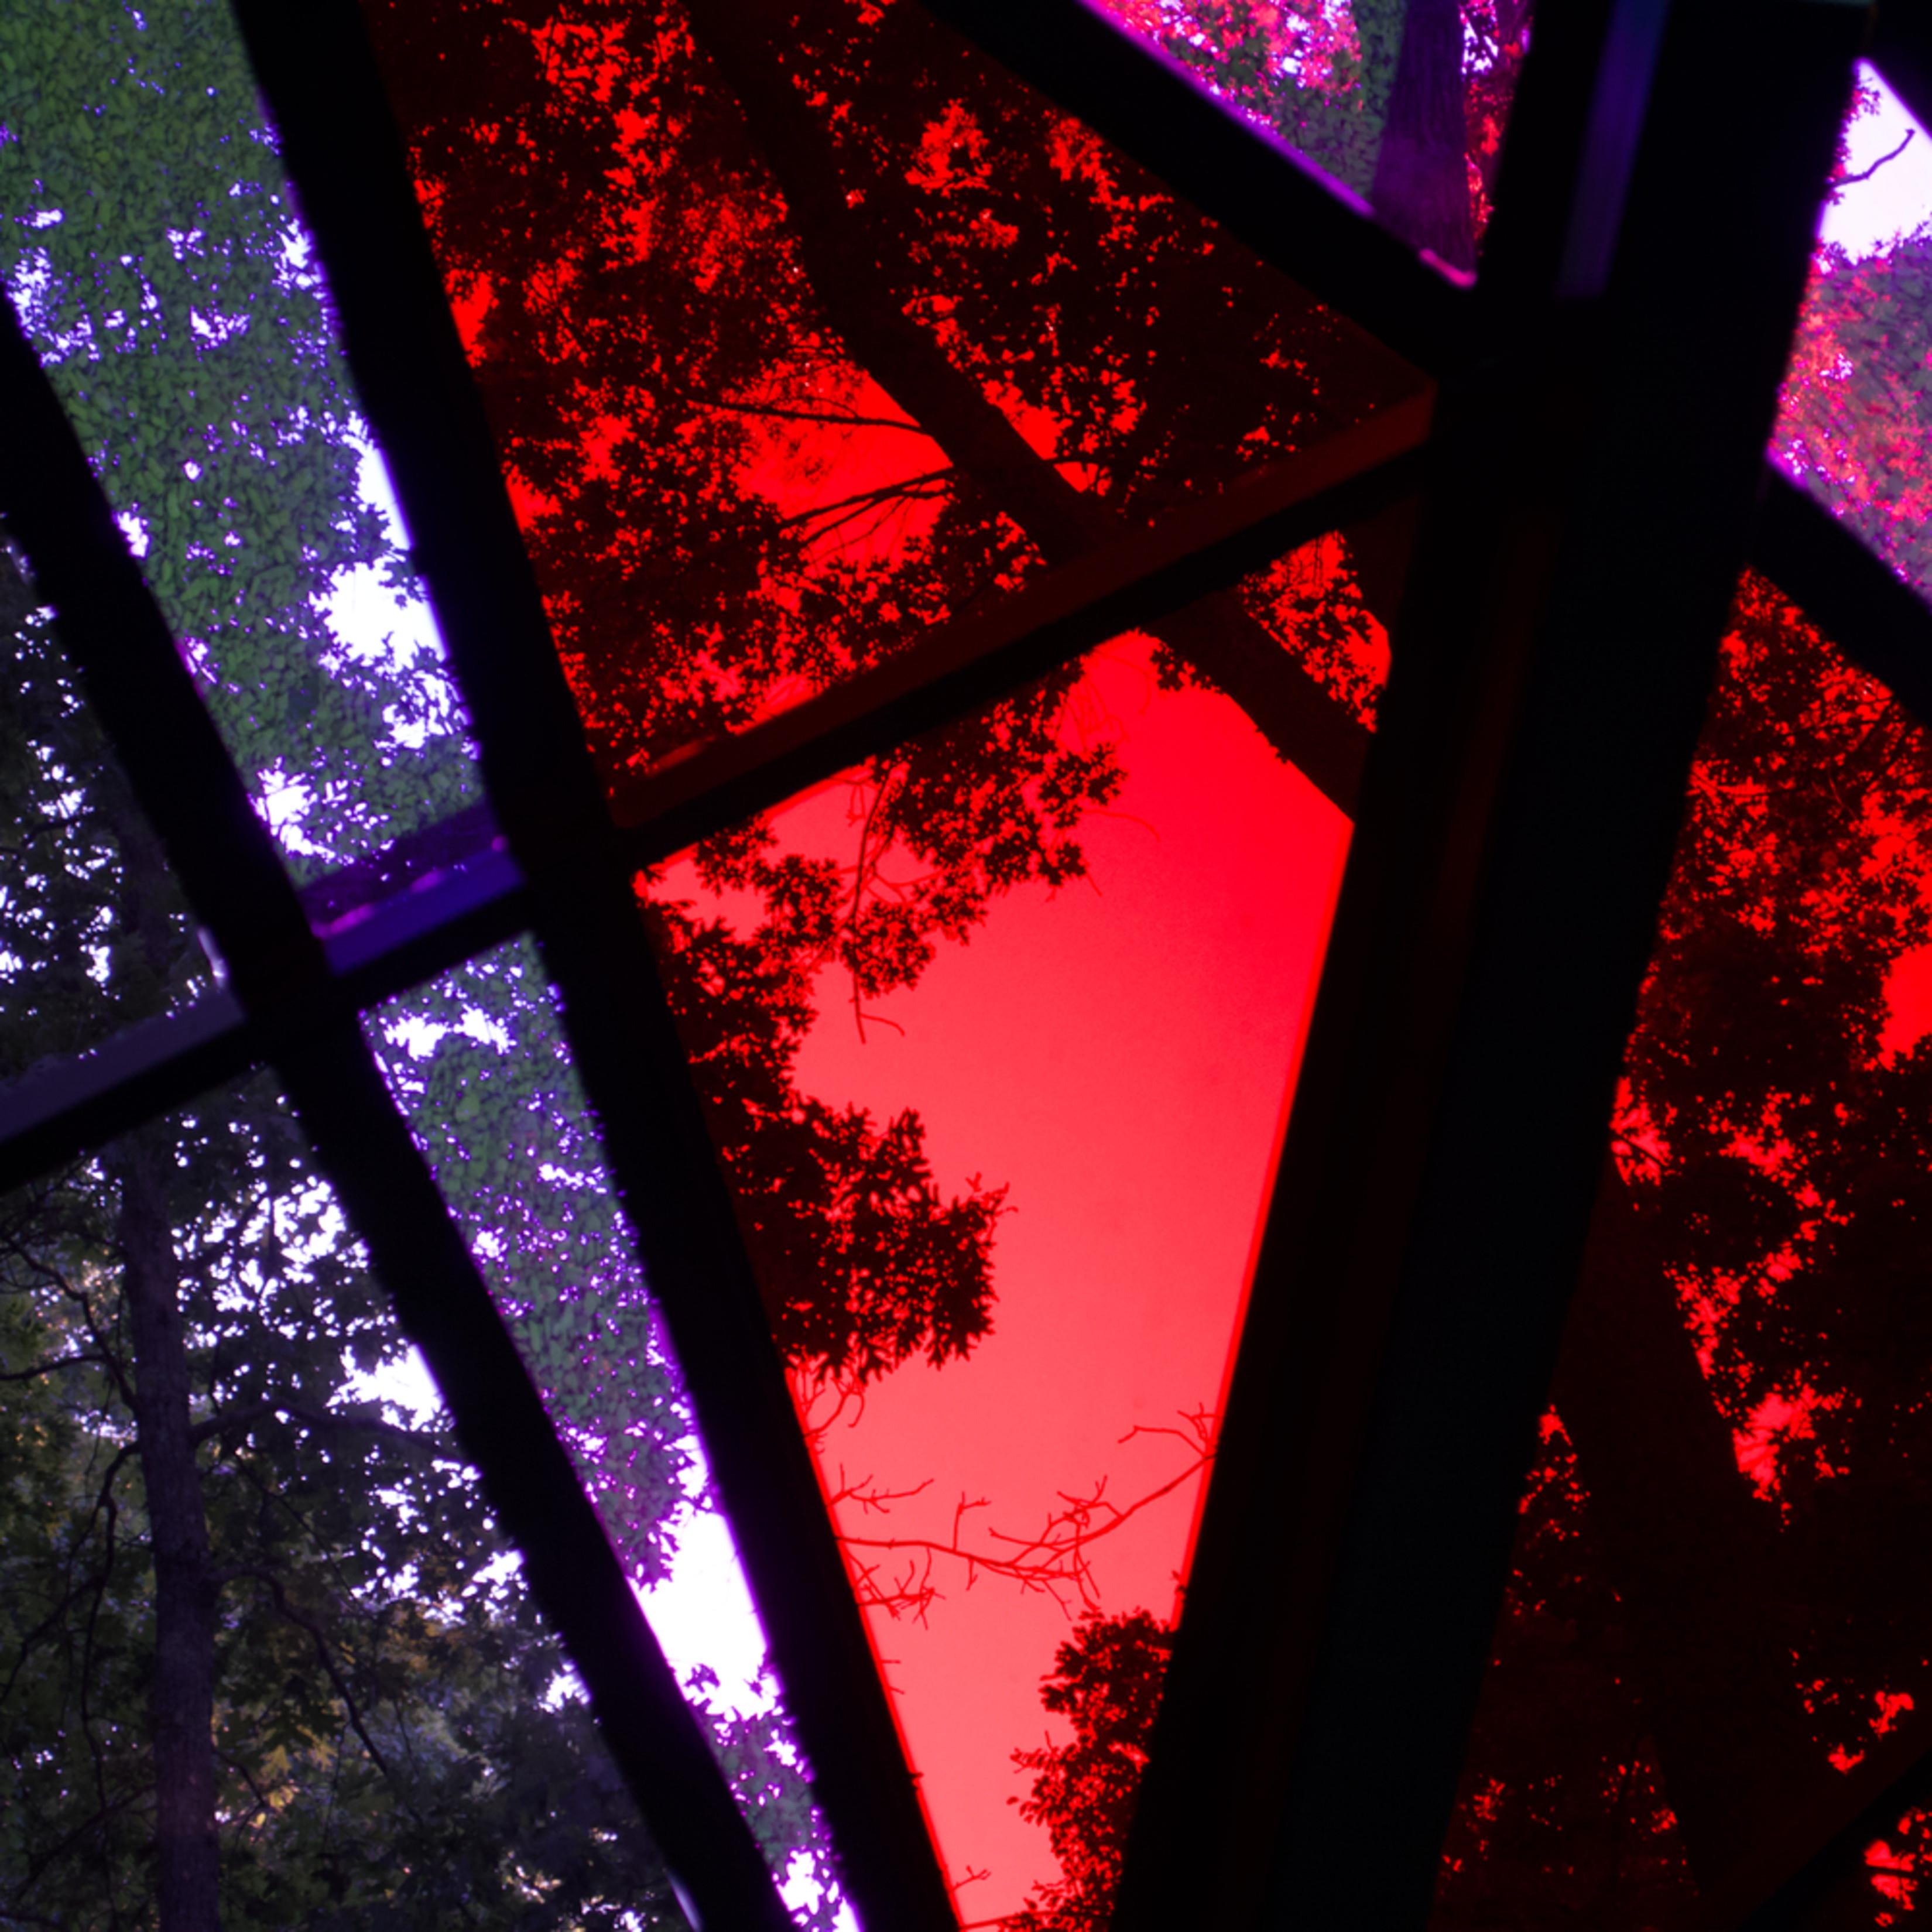 Borelli ashland garden red detail dsc 0565 bphoto wq7vjy